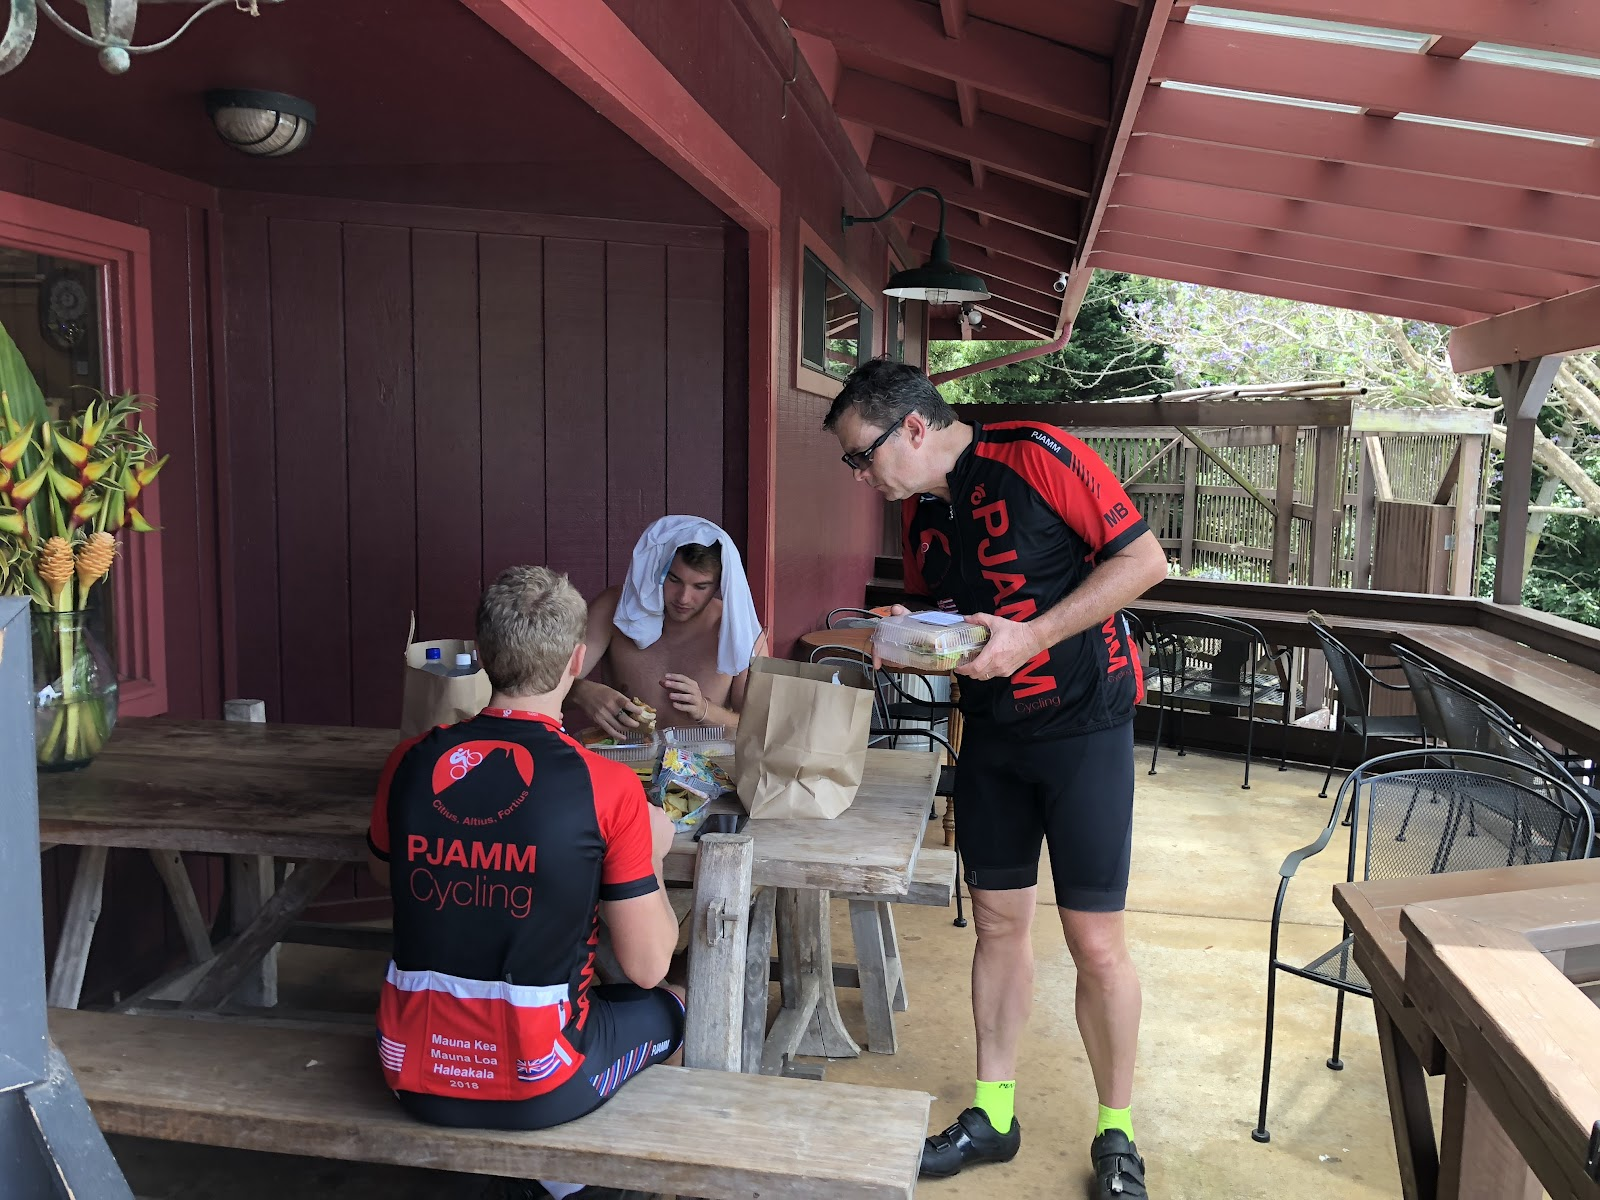 Bike climb Haleakala Volcano - PJAMM cyclists eating lunch Kula Market